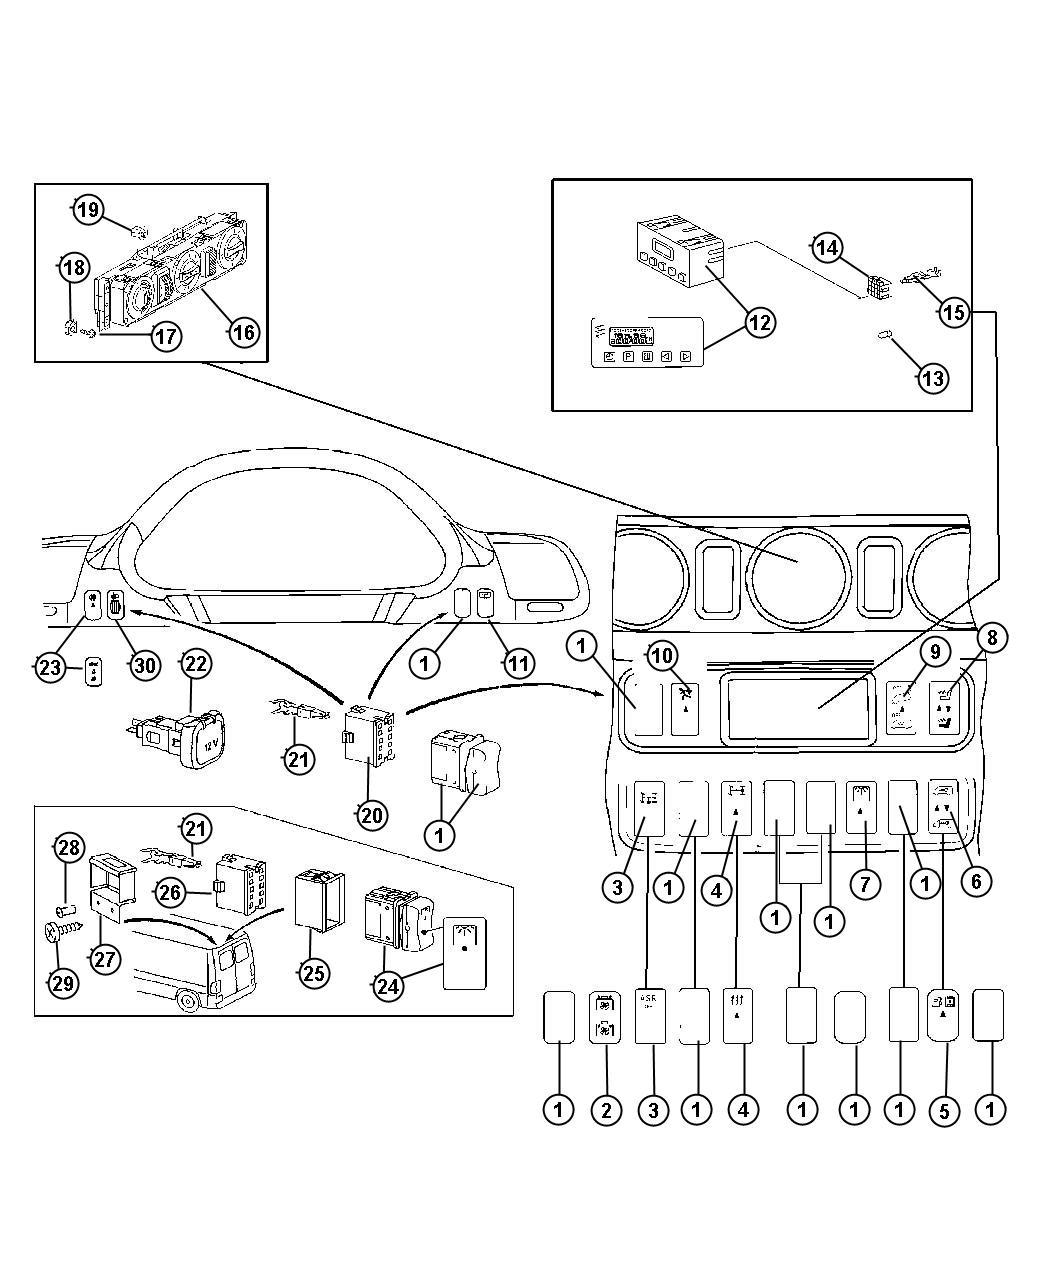 Dodge SPRINTER 3500 Switch. Cargo Lamp. [xzg]. Electrical